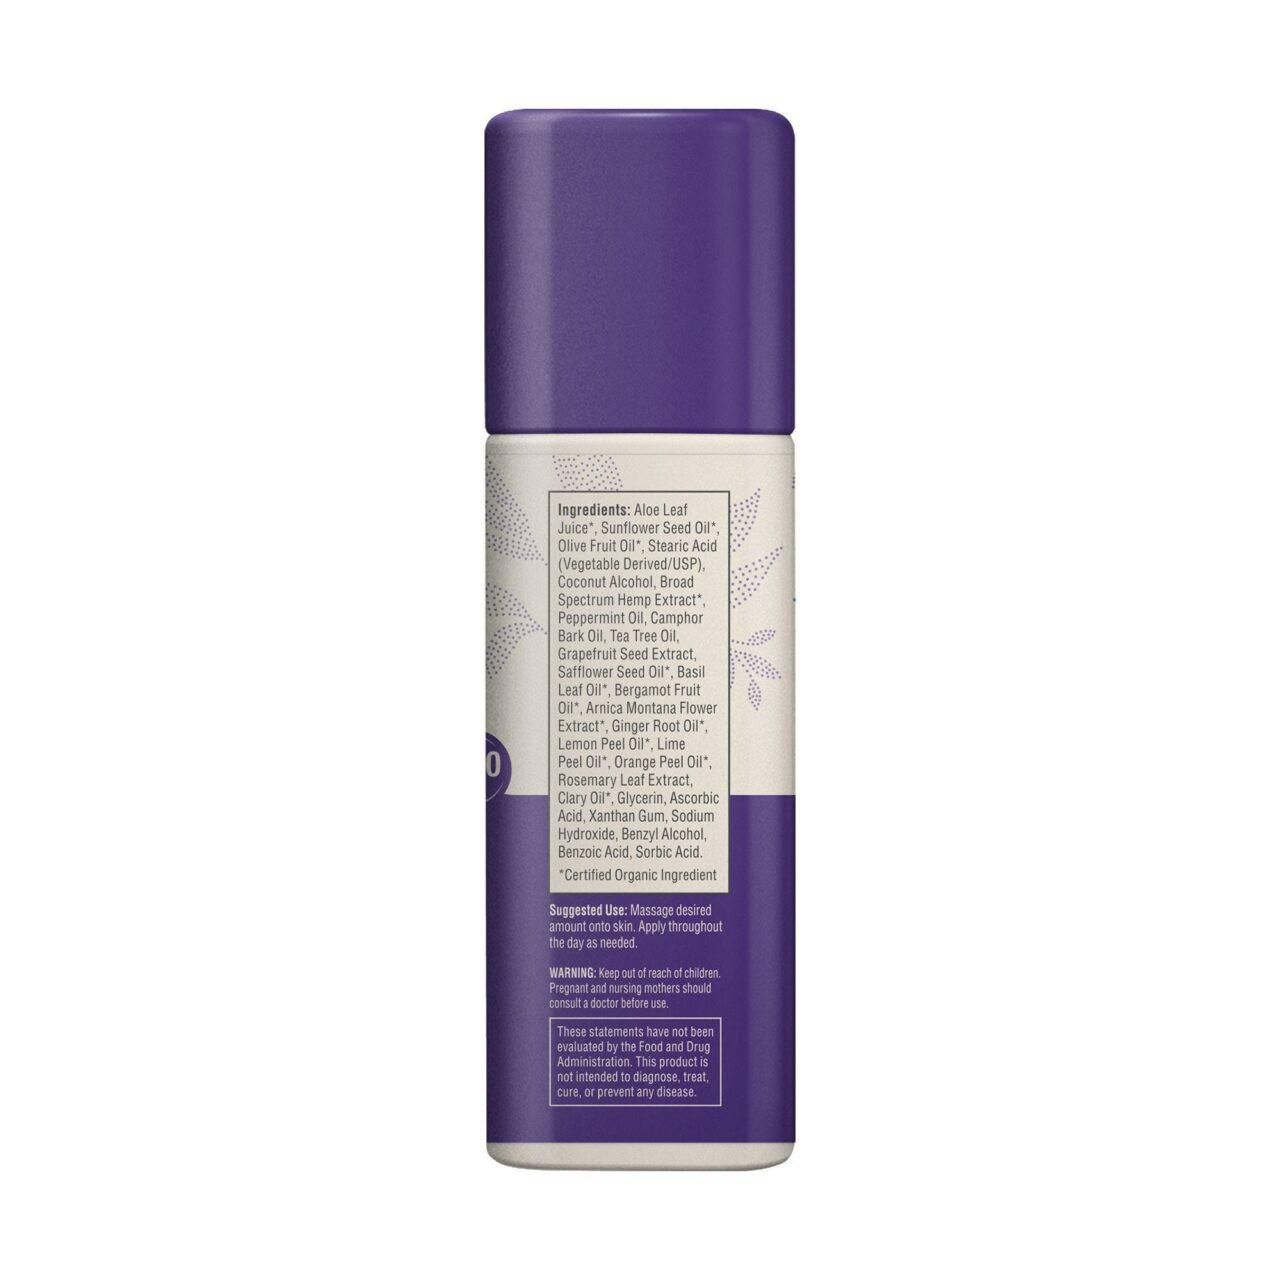 Medterra, Wellness Nature's Relief Daily CBD Cream, Broad Spectrum THC-Free, 1.7oz, 1000mg CBD 4